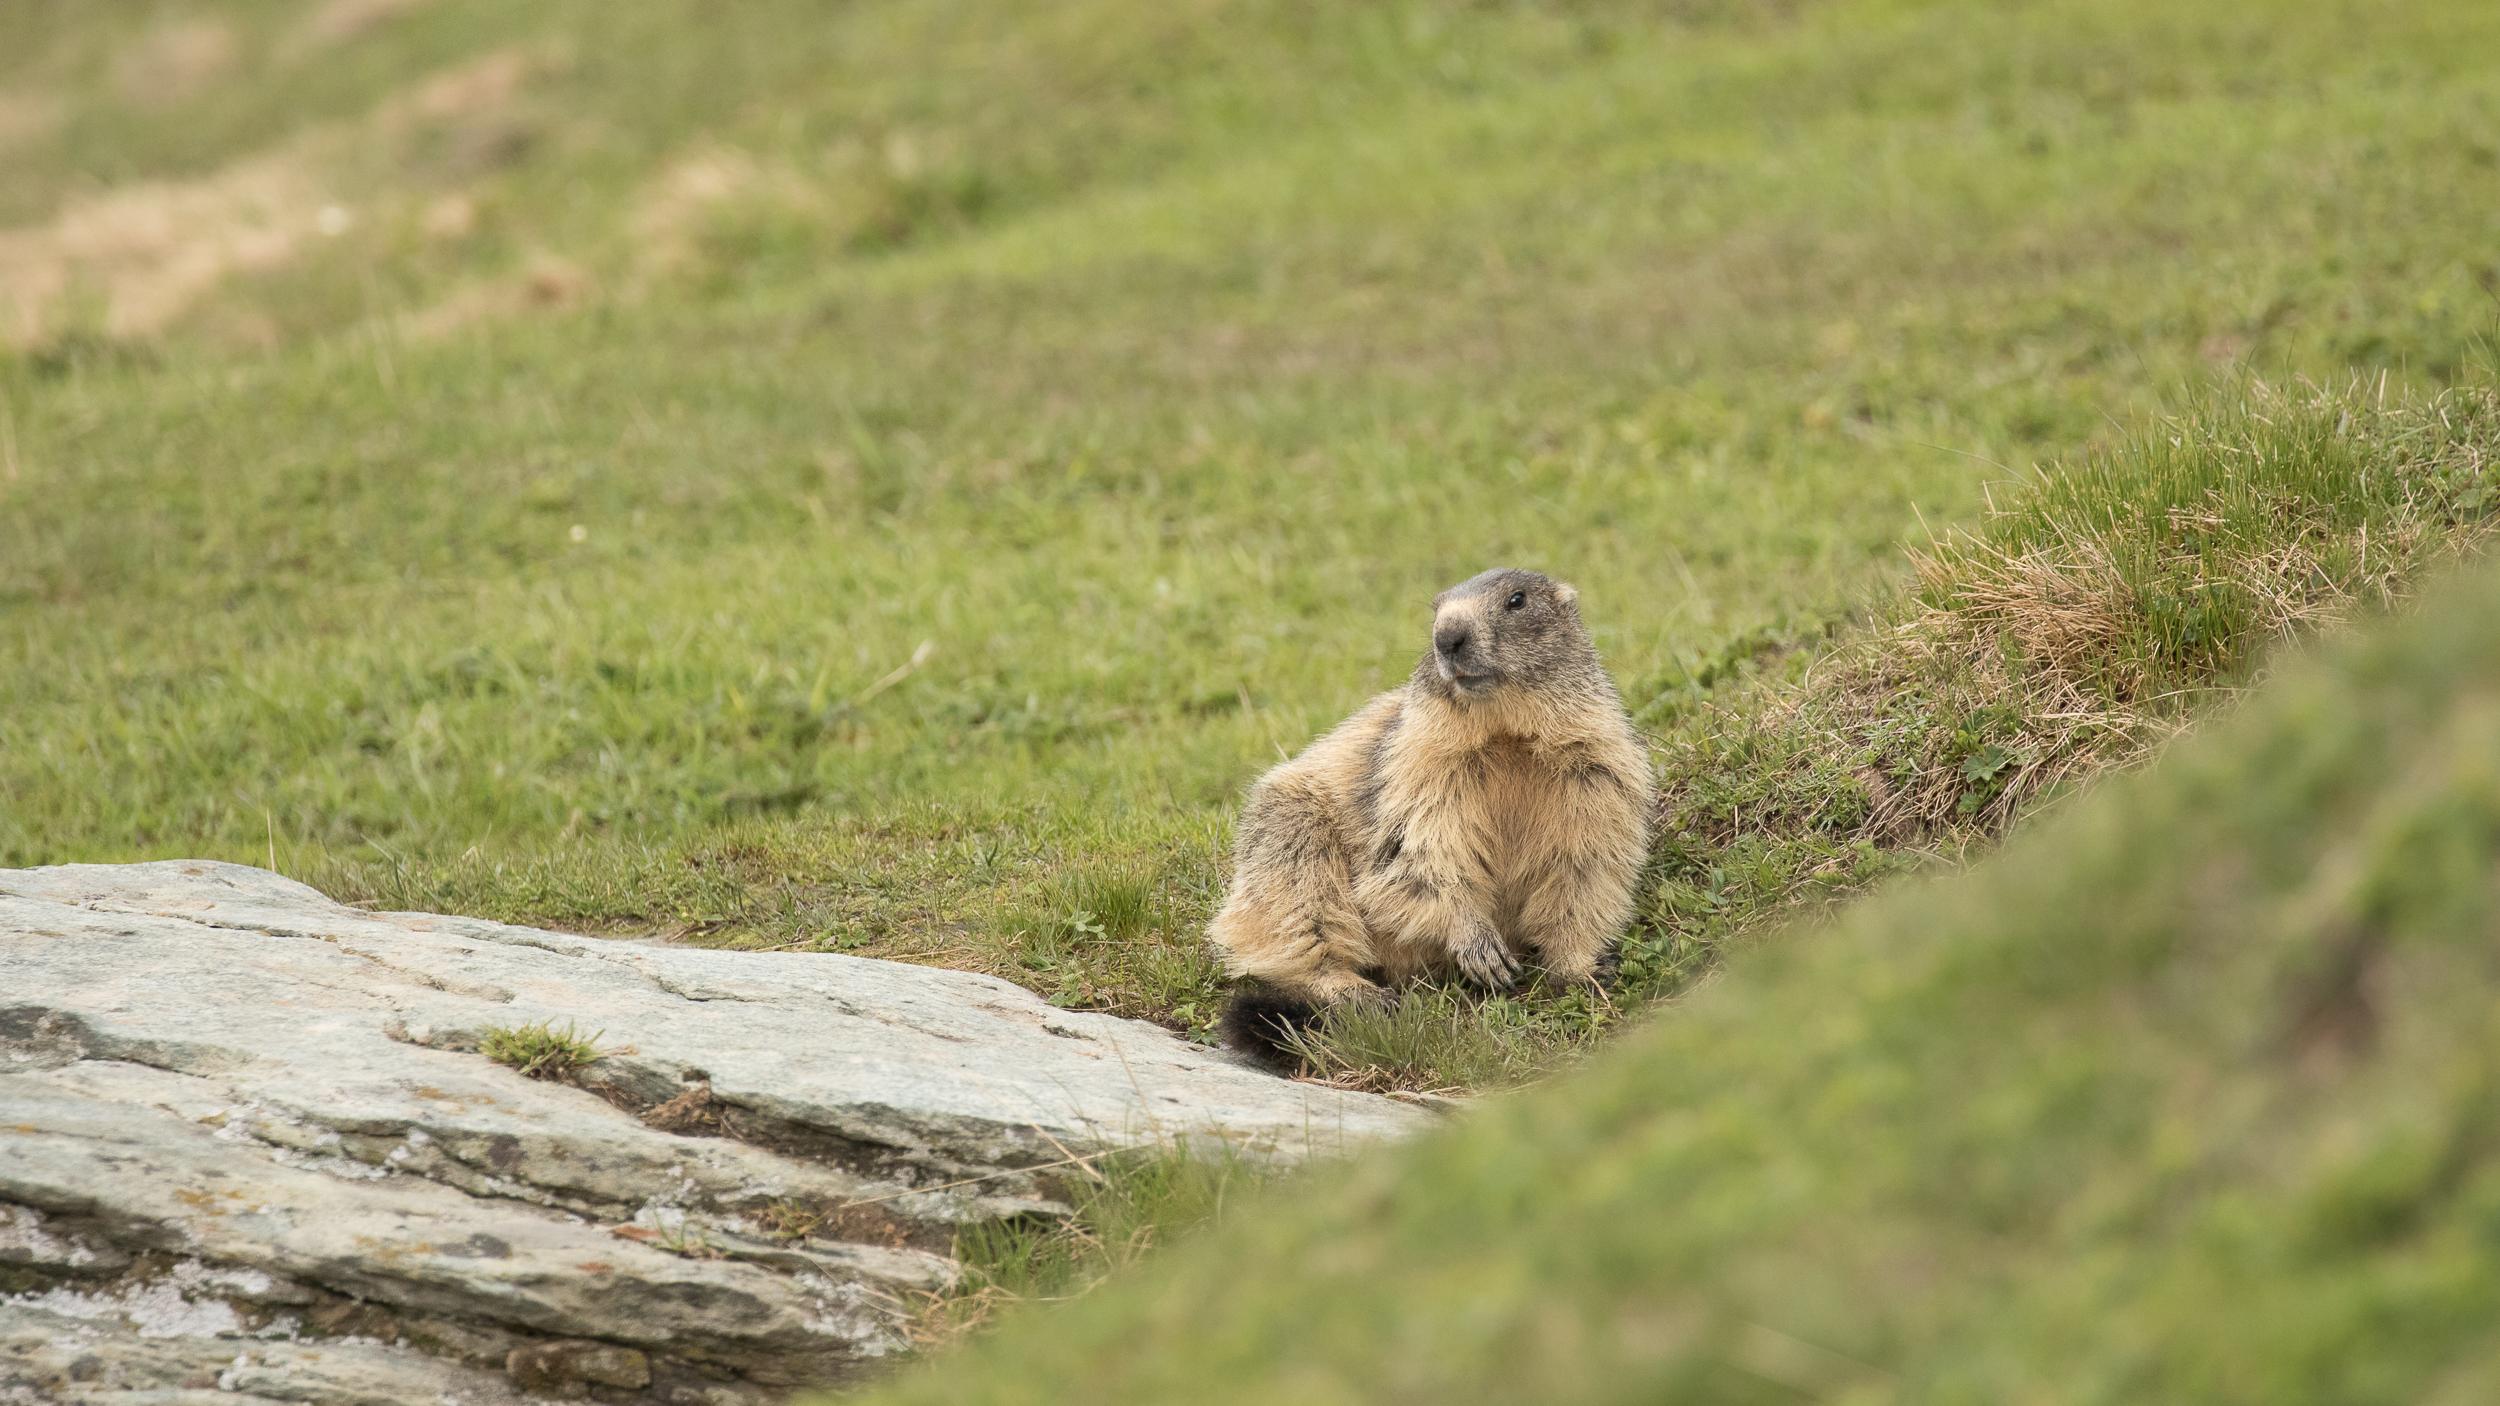 marmotte-parc-national-grand-paradis-italie